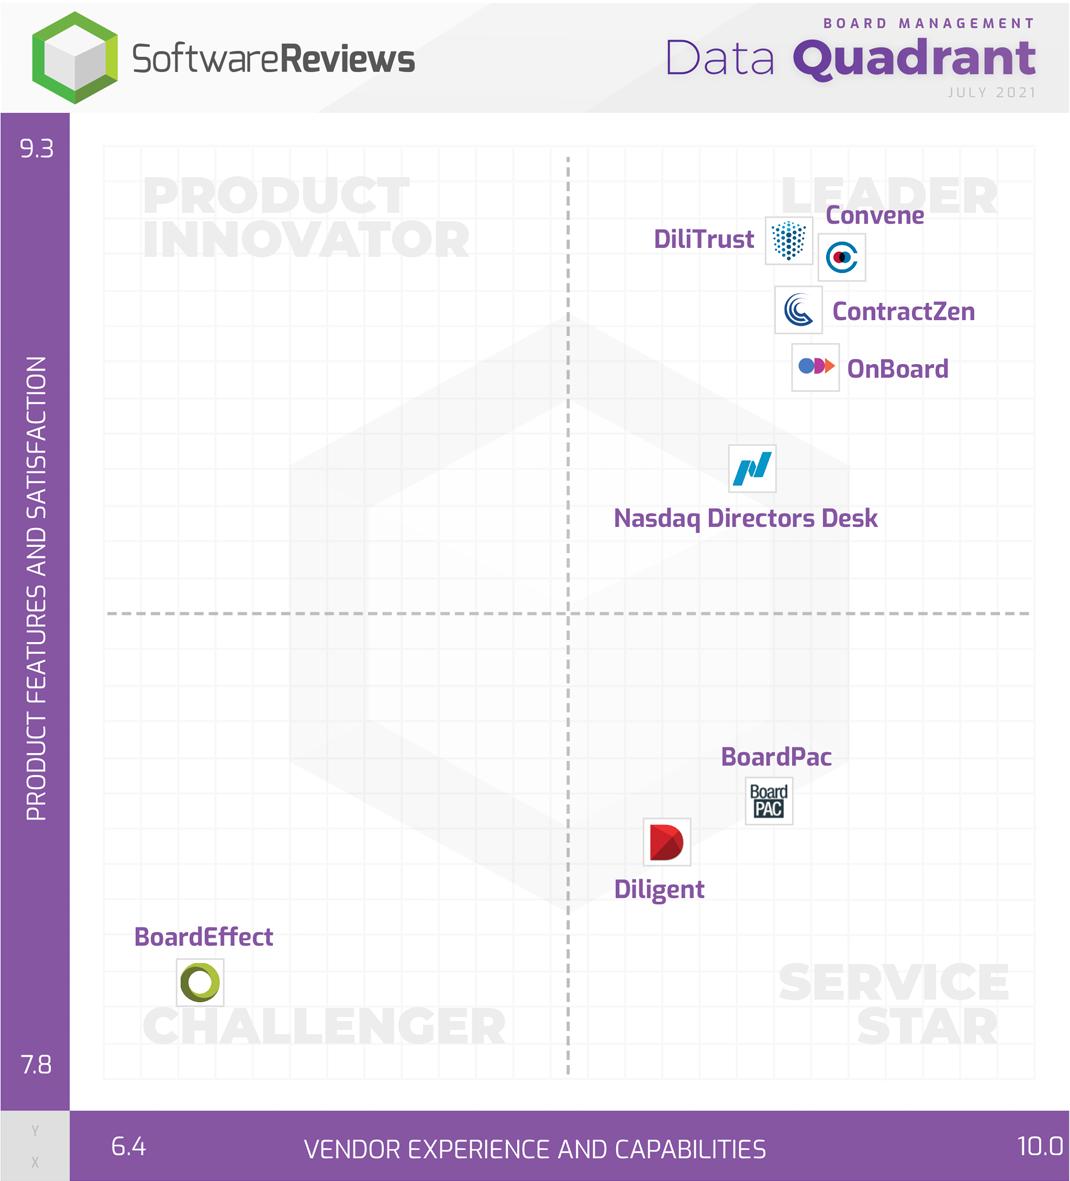 Board Management Data Quadrant